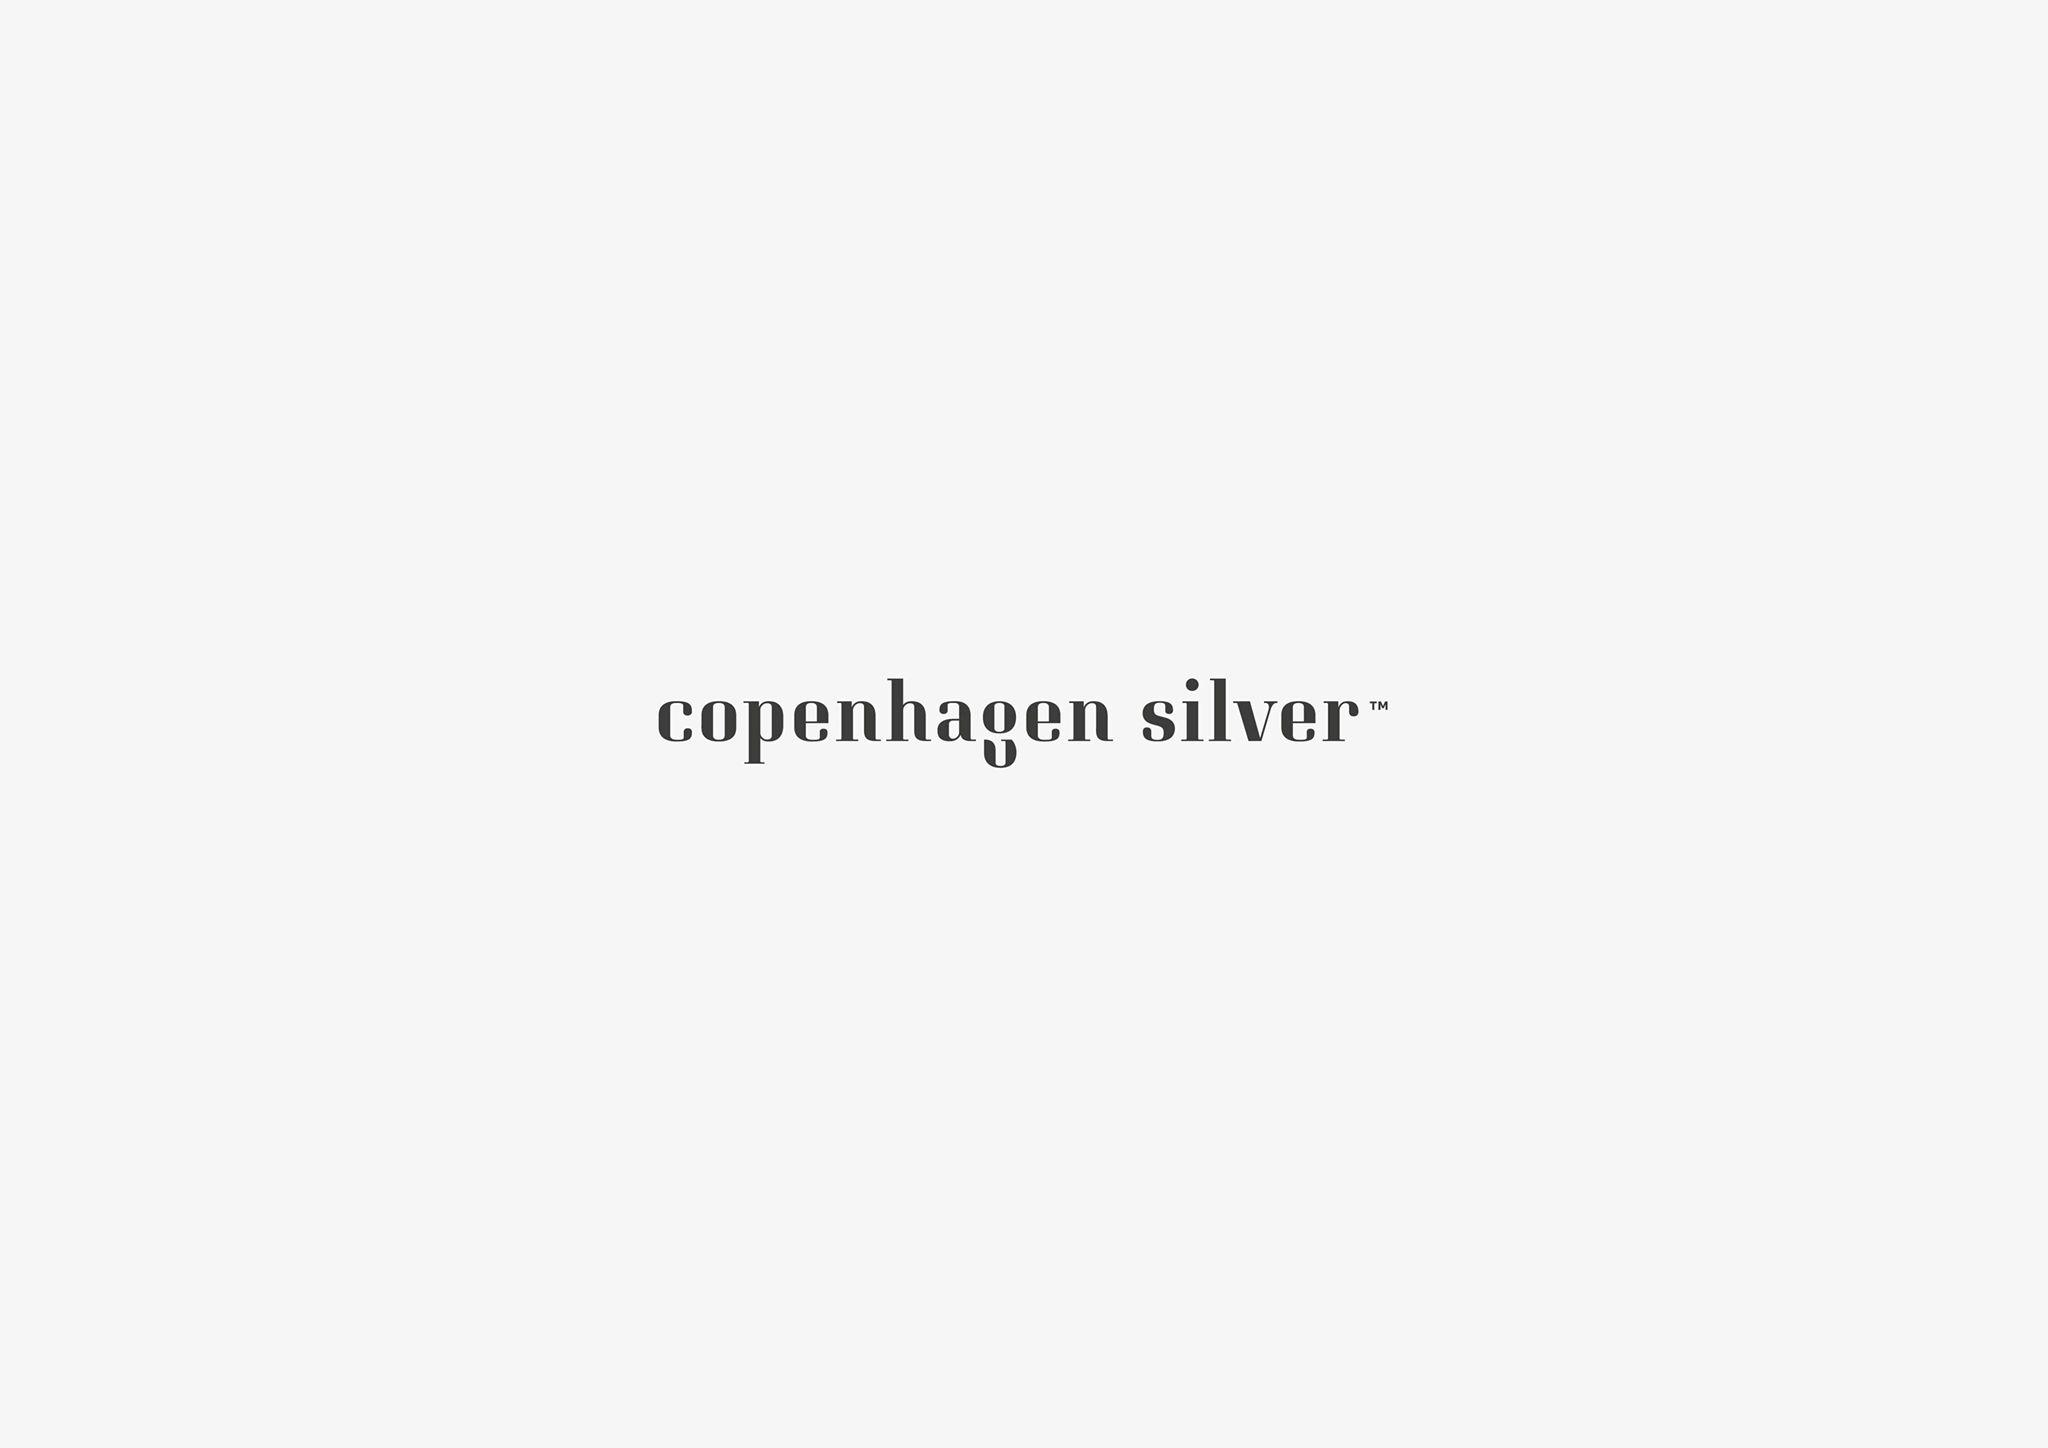 Copenhagen Silver logo